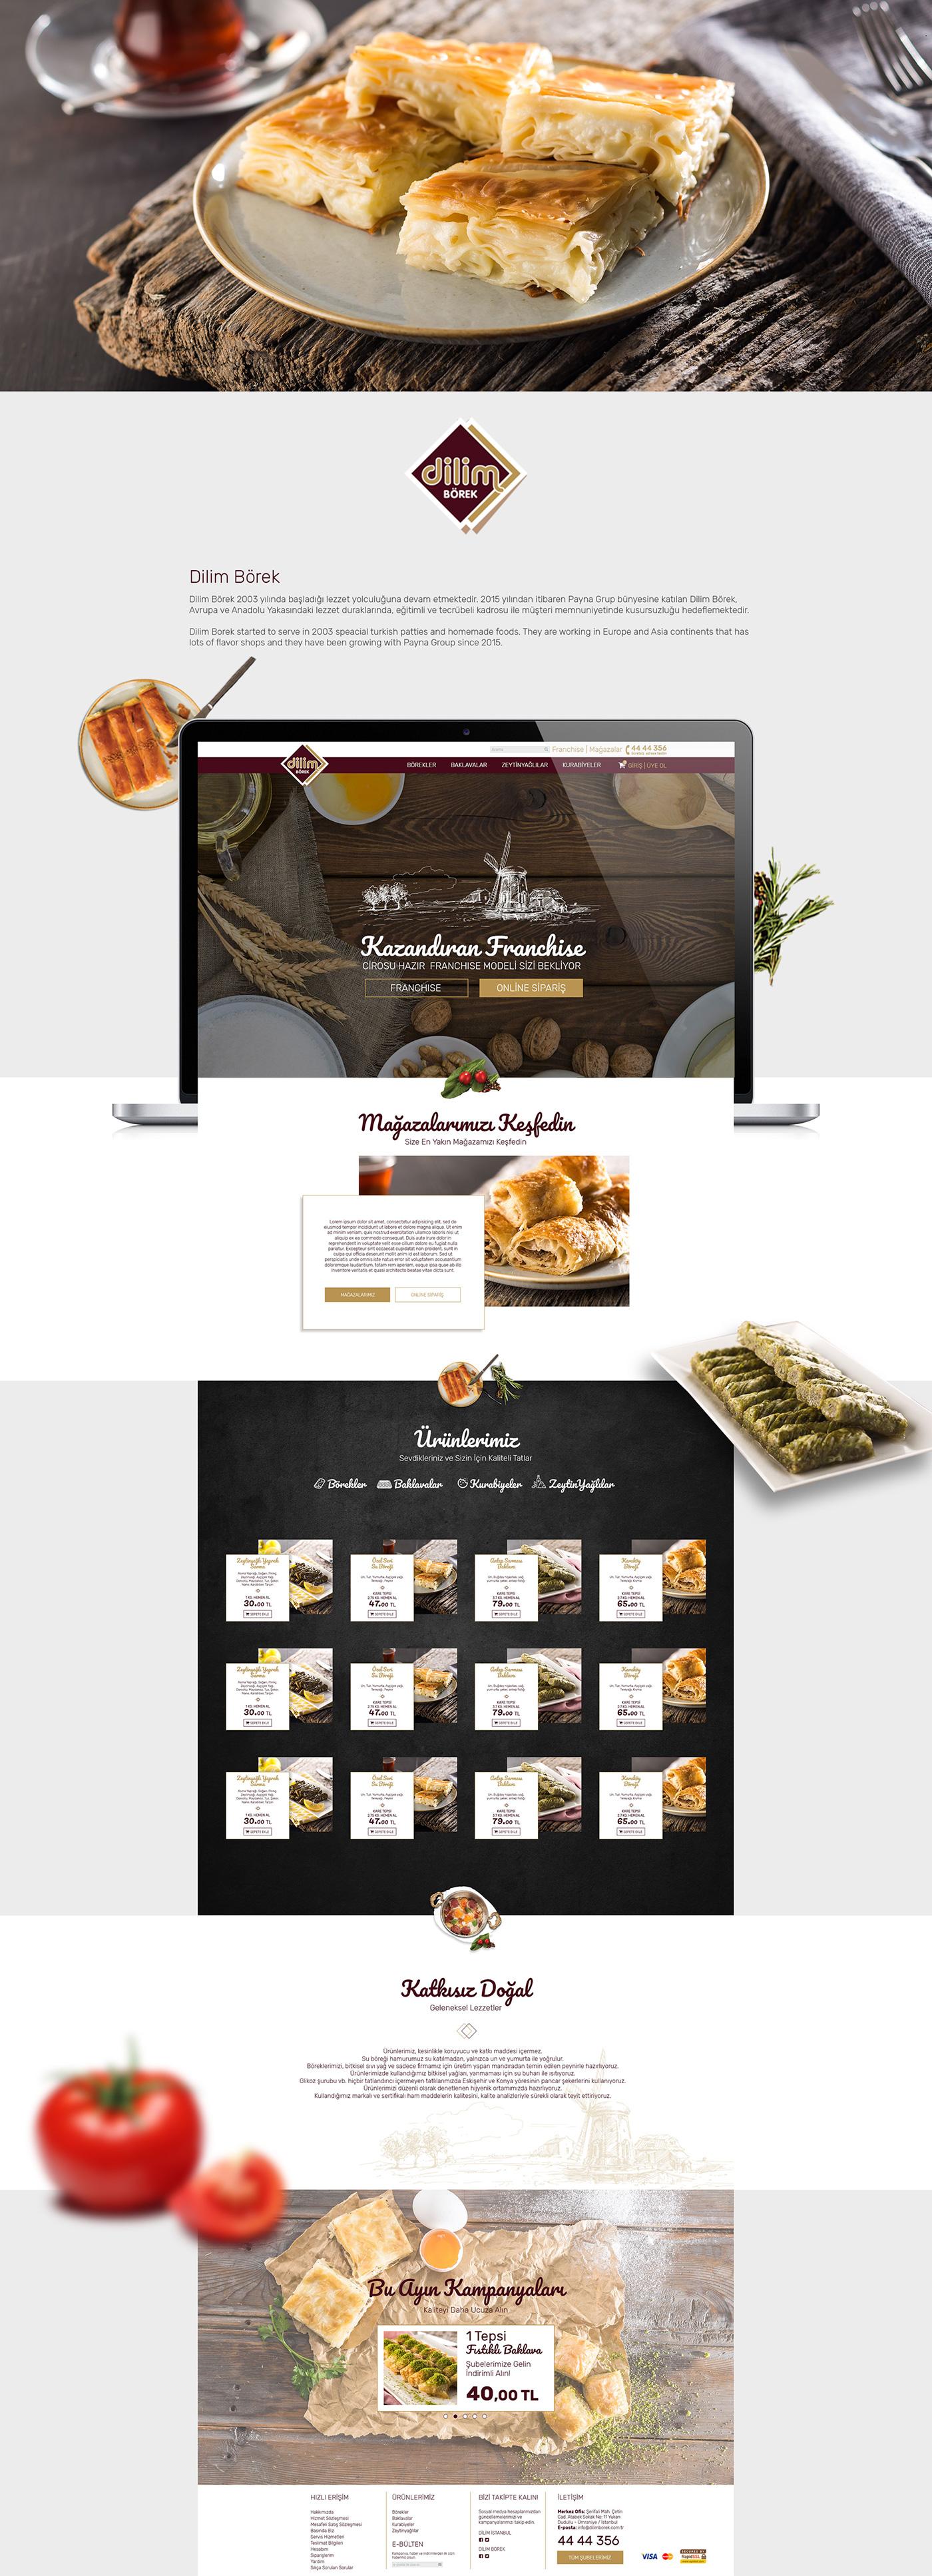 bakery,Web,Web Design ,ui design,bootstrap,Food web,Online shop,Patties,patty,dilim börek